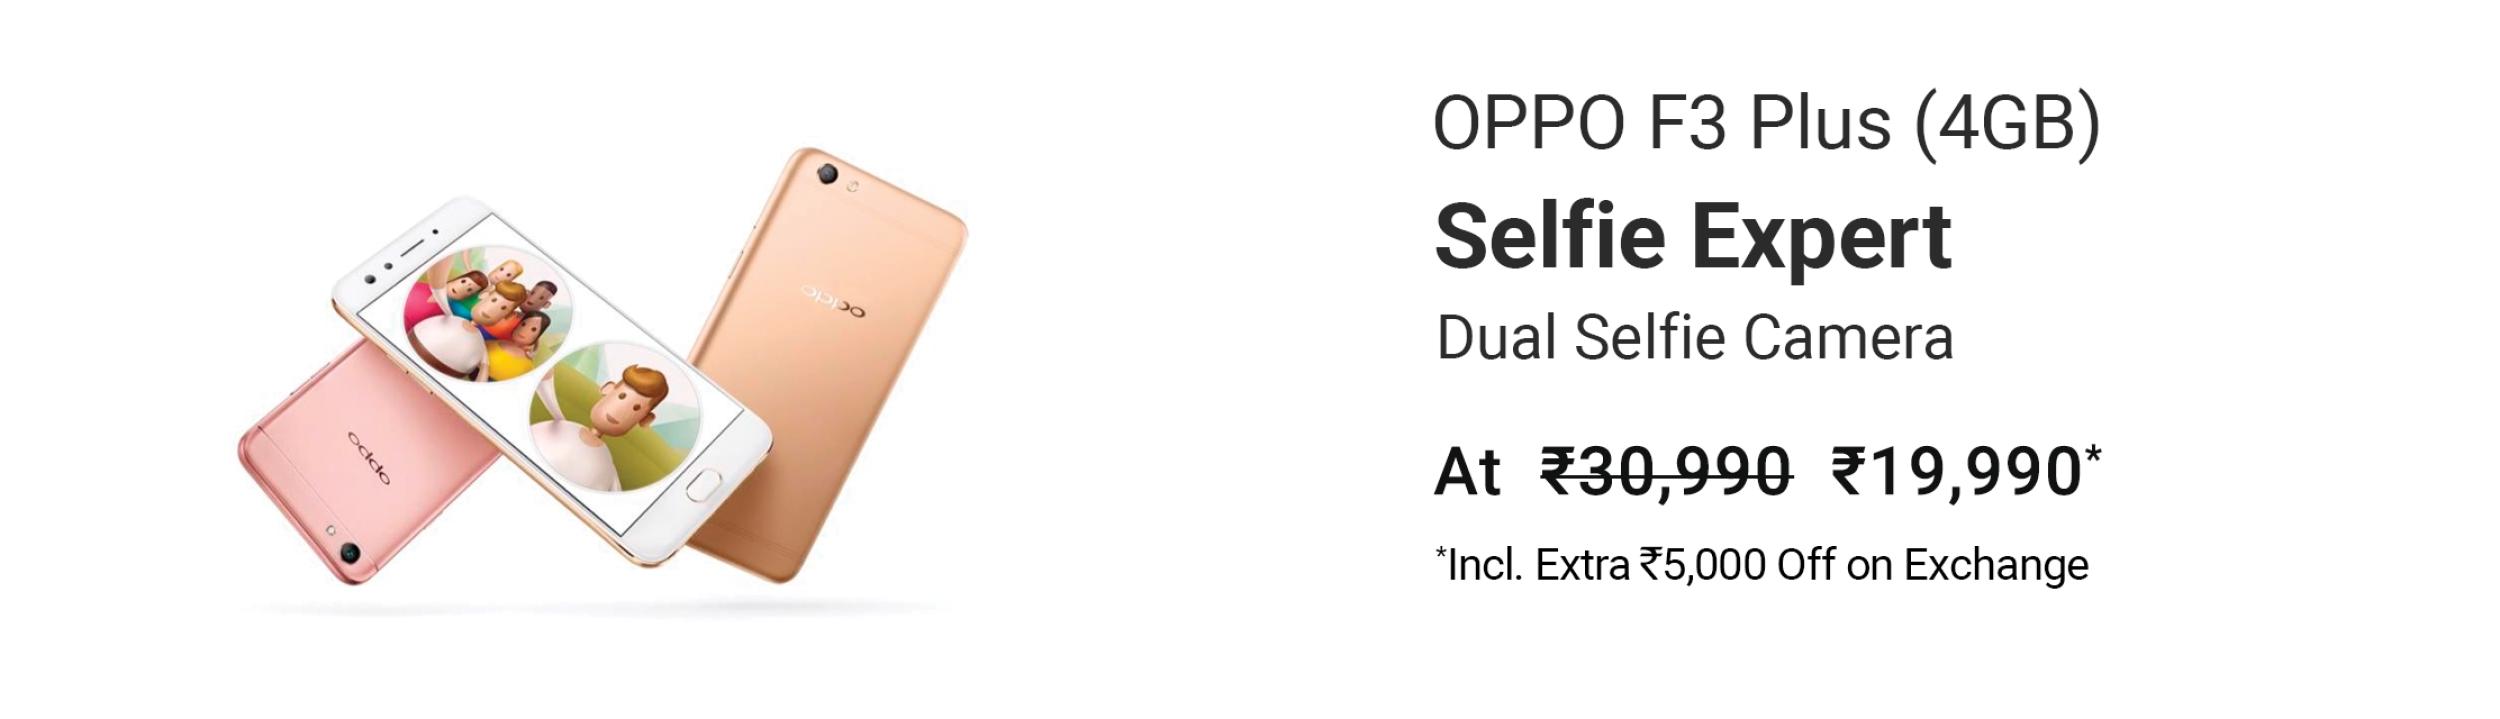 OPPO F3 Plus 4GB OD